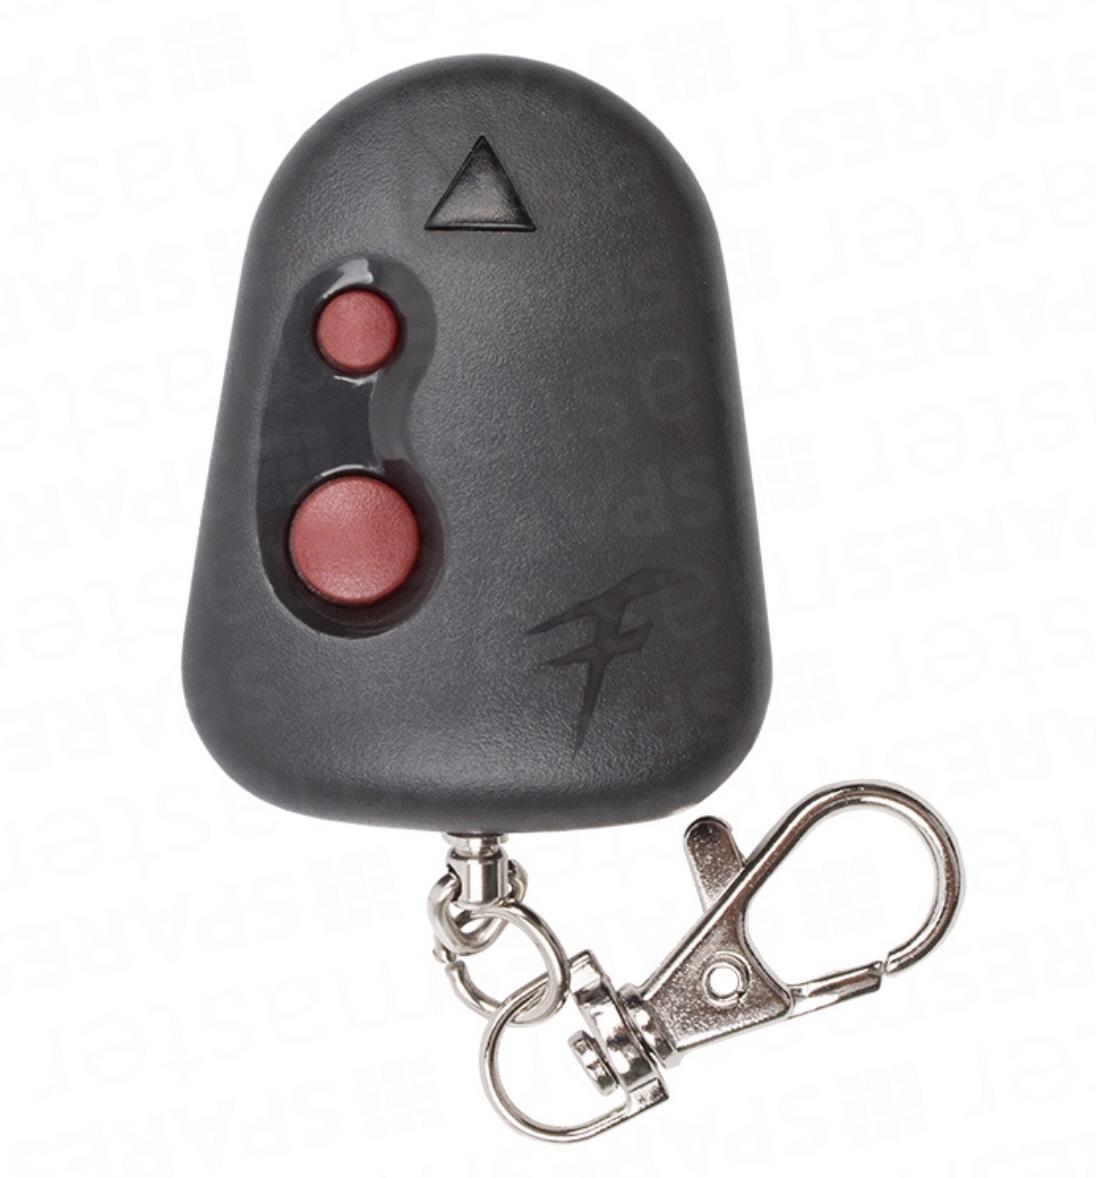 Steel Line Later Style Keyfob Remote Handset AZAR2058